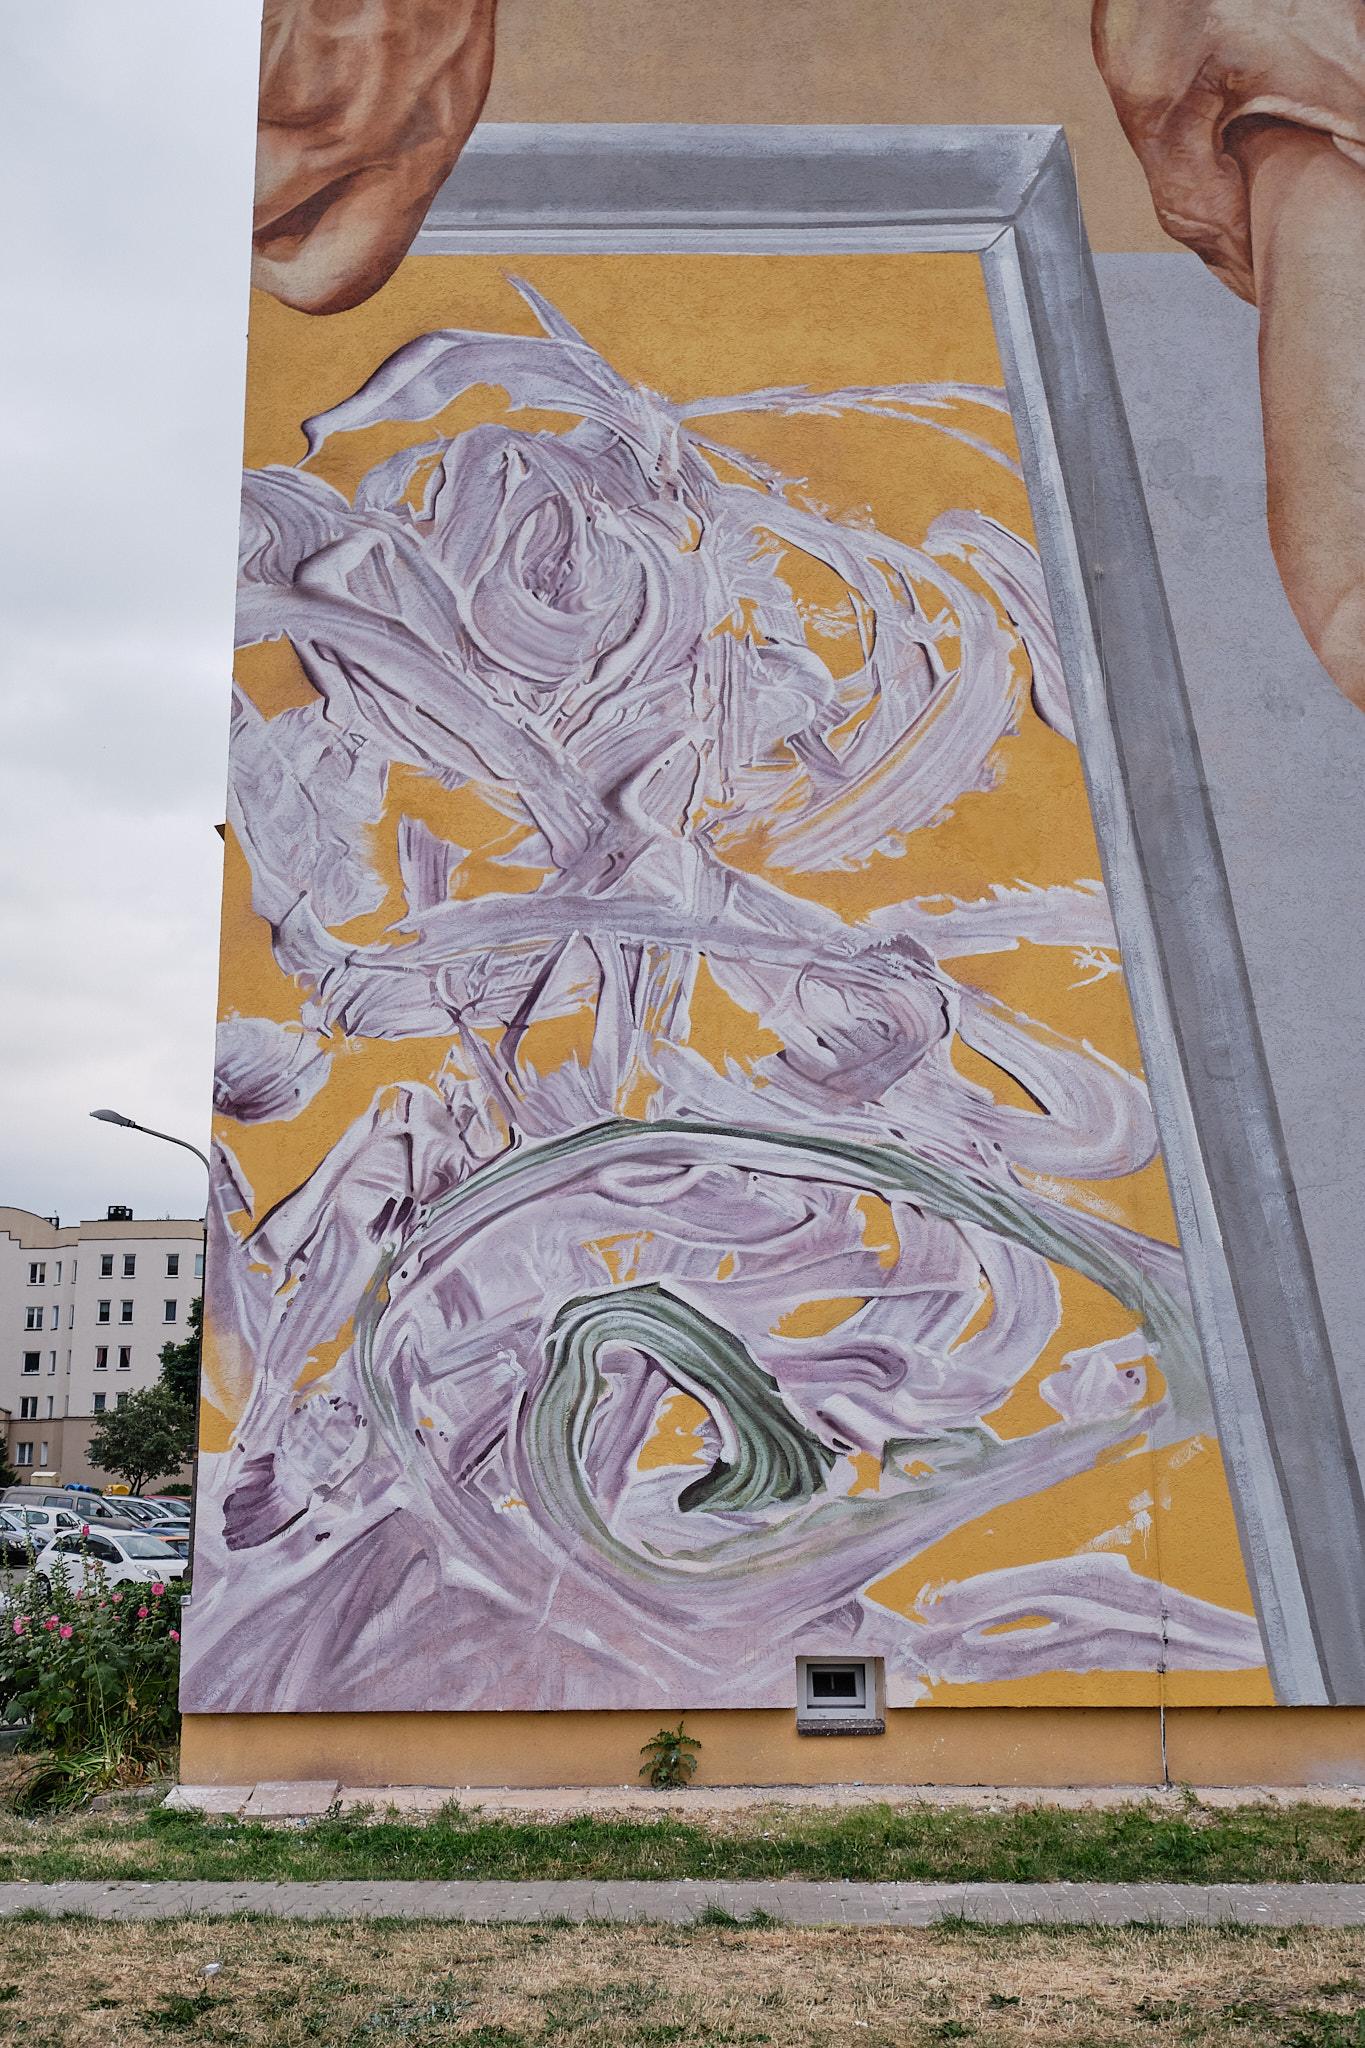 Street Artist Guido van Helten draws Inspiration from the